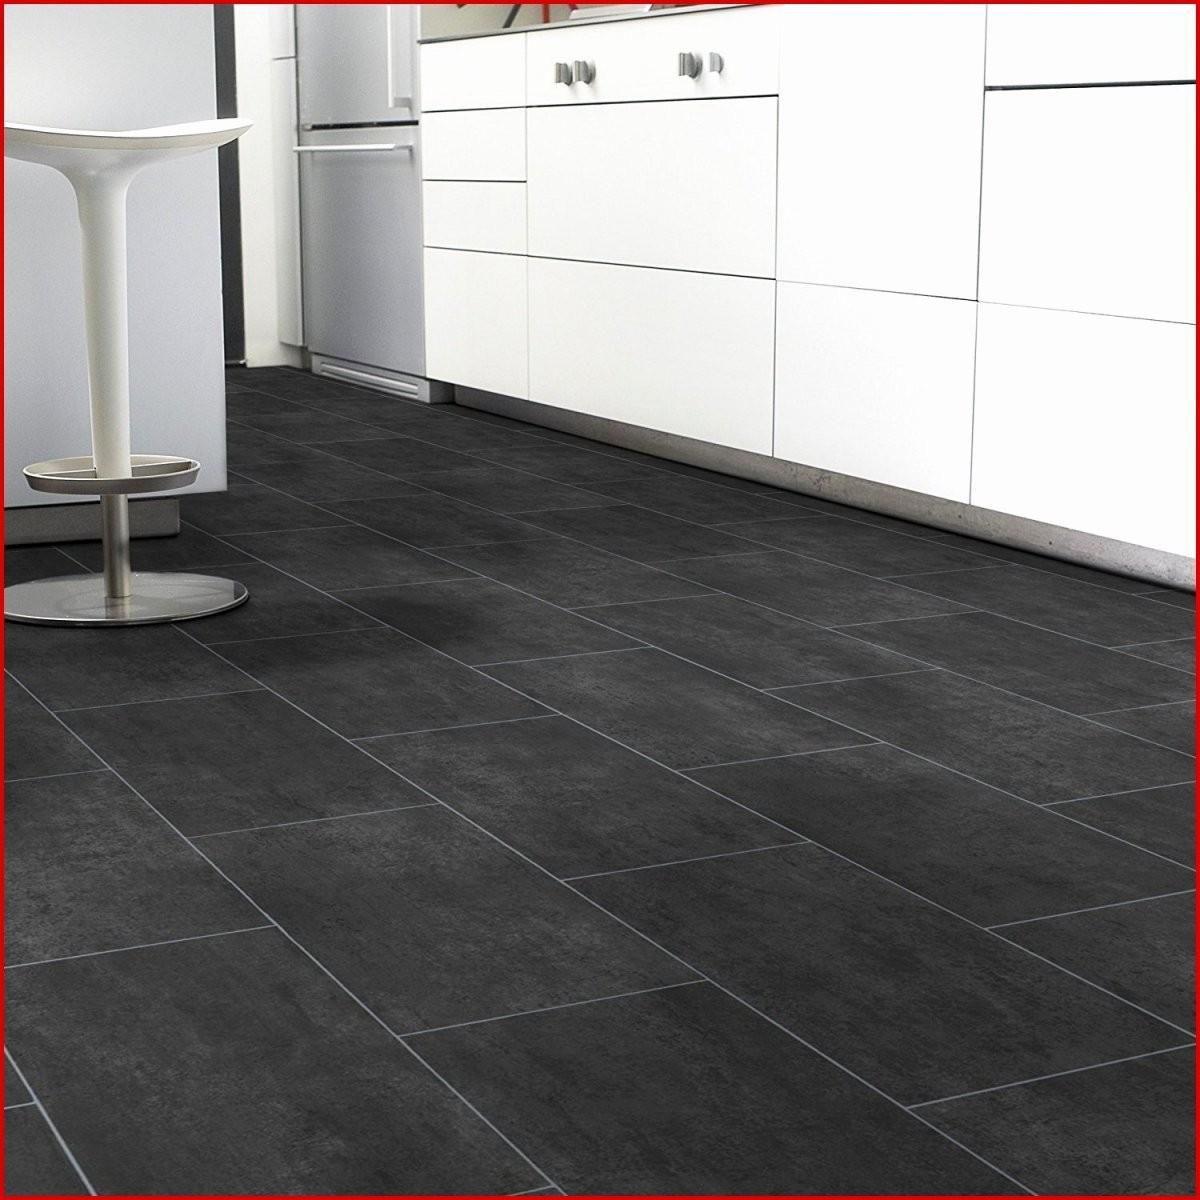 Vinylboden Fliesenoptik Grau Einzigartig Pvc Boden Fliesenoptik von Pvc Boden Fliesenoptik Grau Bild